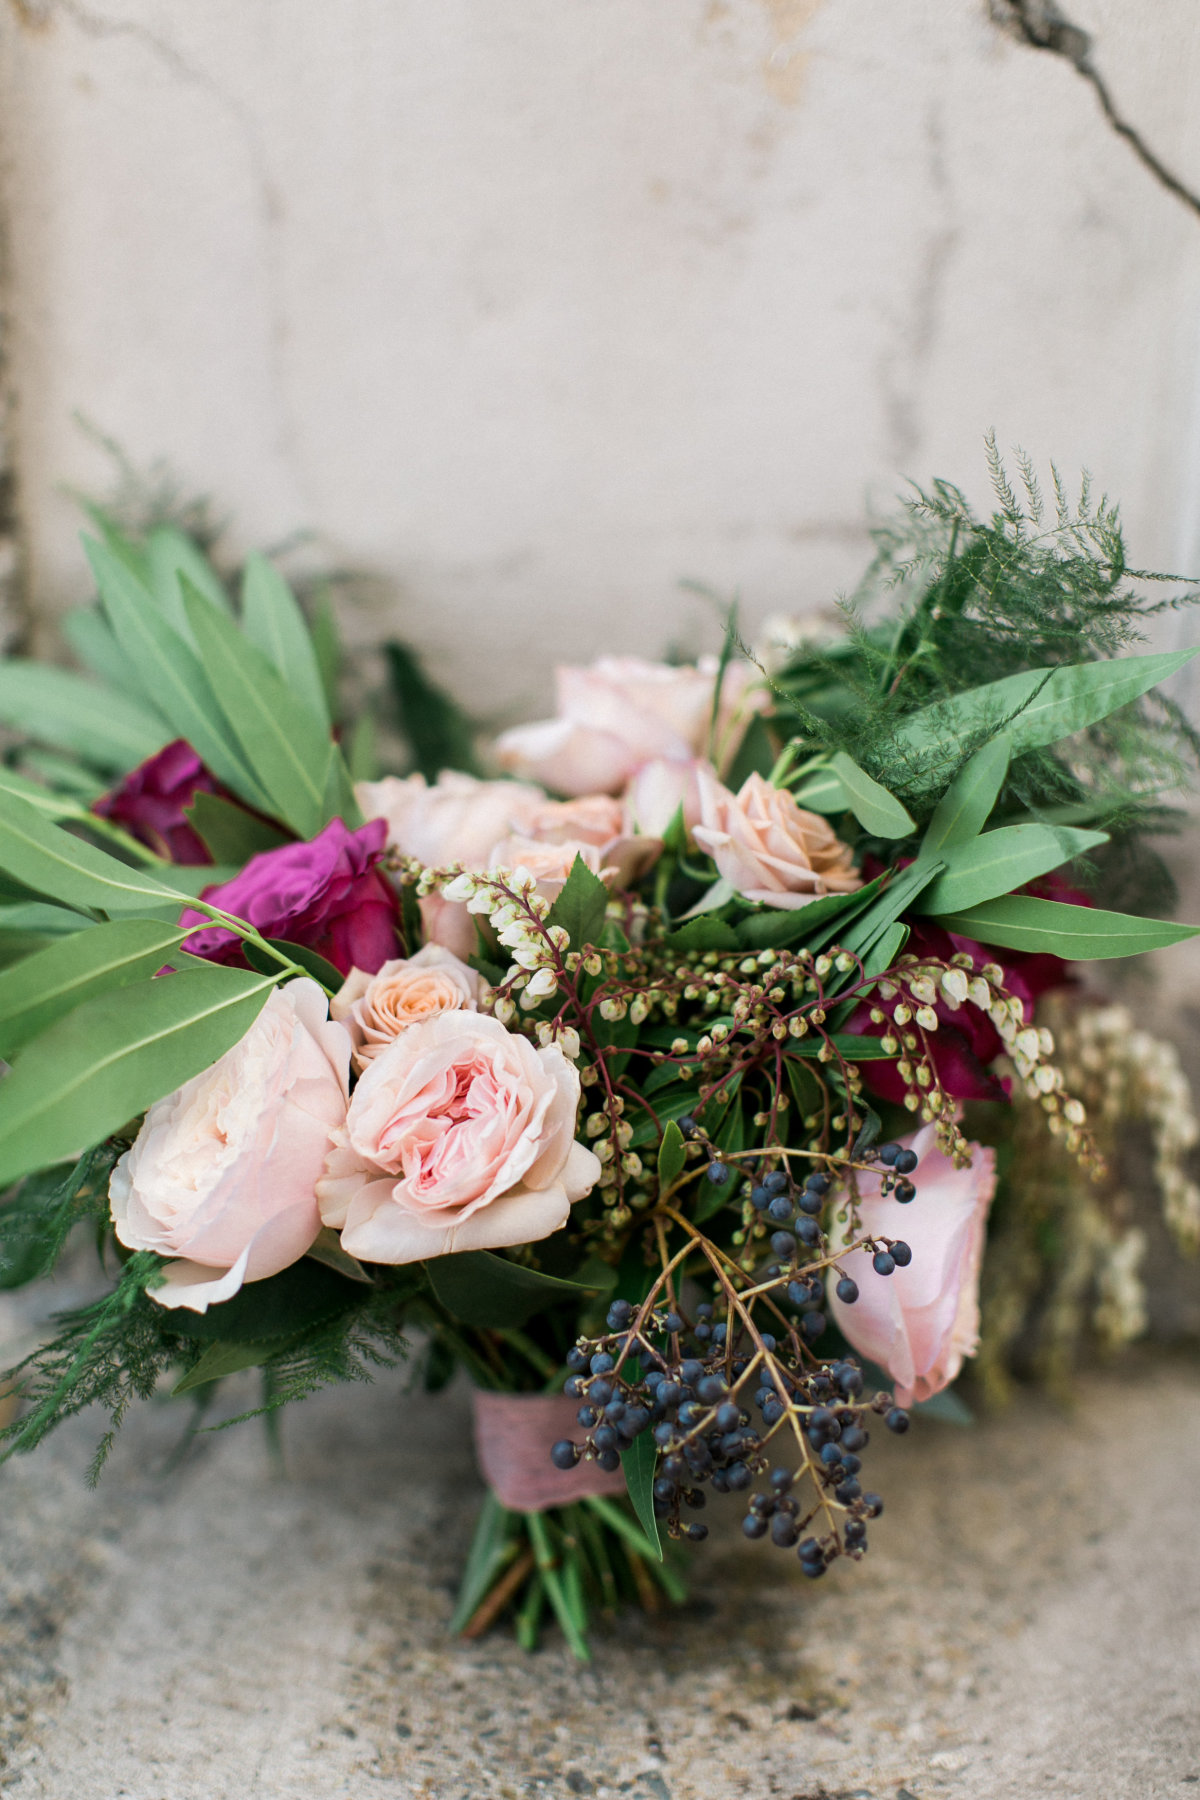 romantic-florals-from-seaside-wedding-inspiration-palos-verdes-california